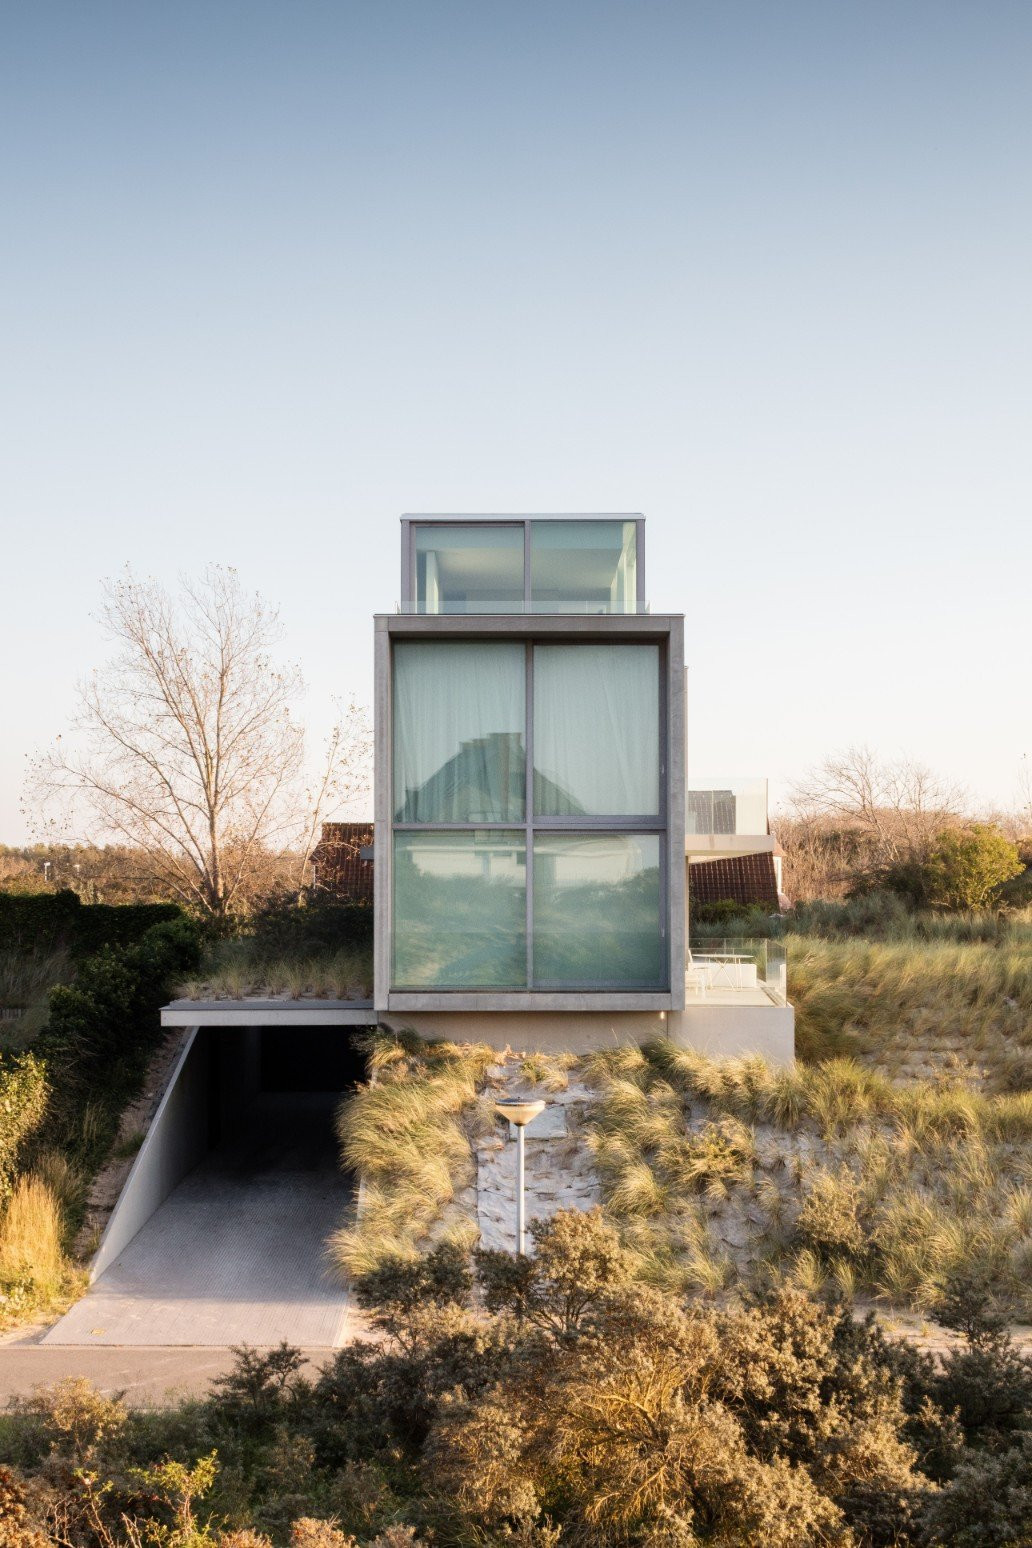 Rietveldprojects-saarinen-appartement-design-architectuur-kust-tvdv18_1032x0.jpg